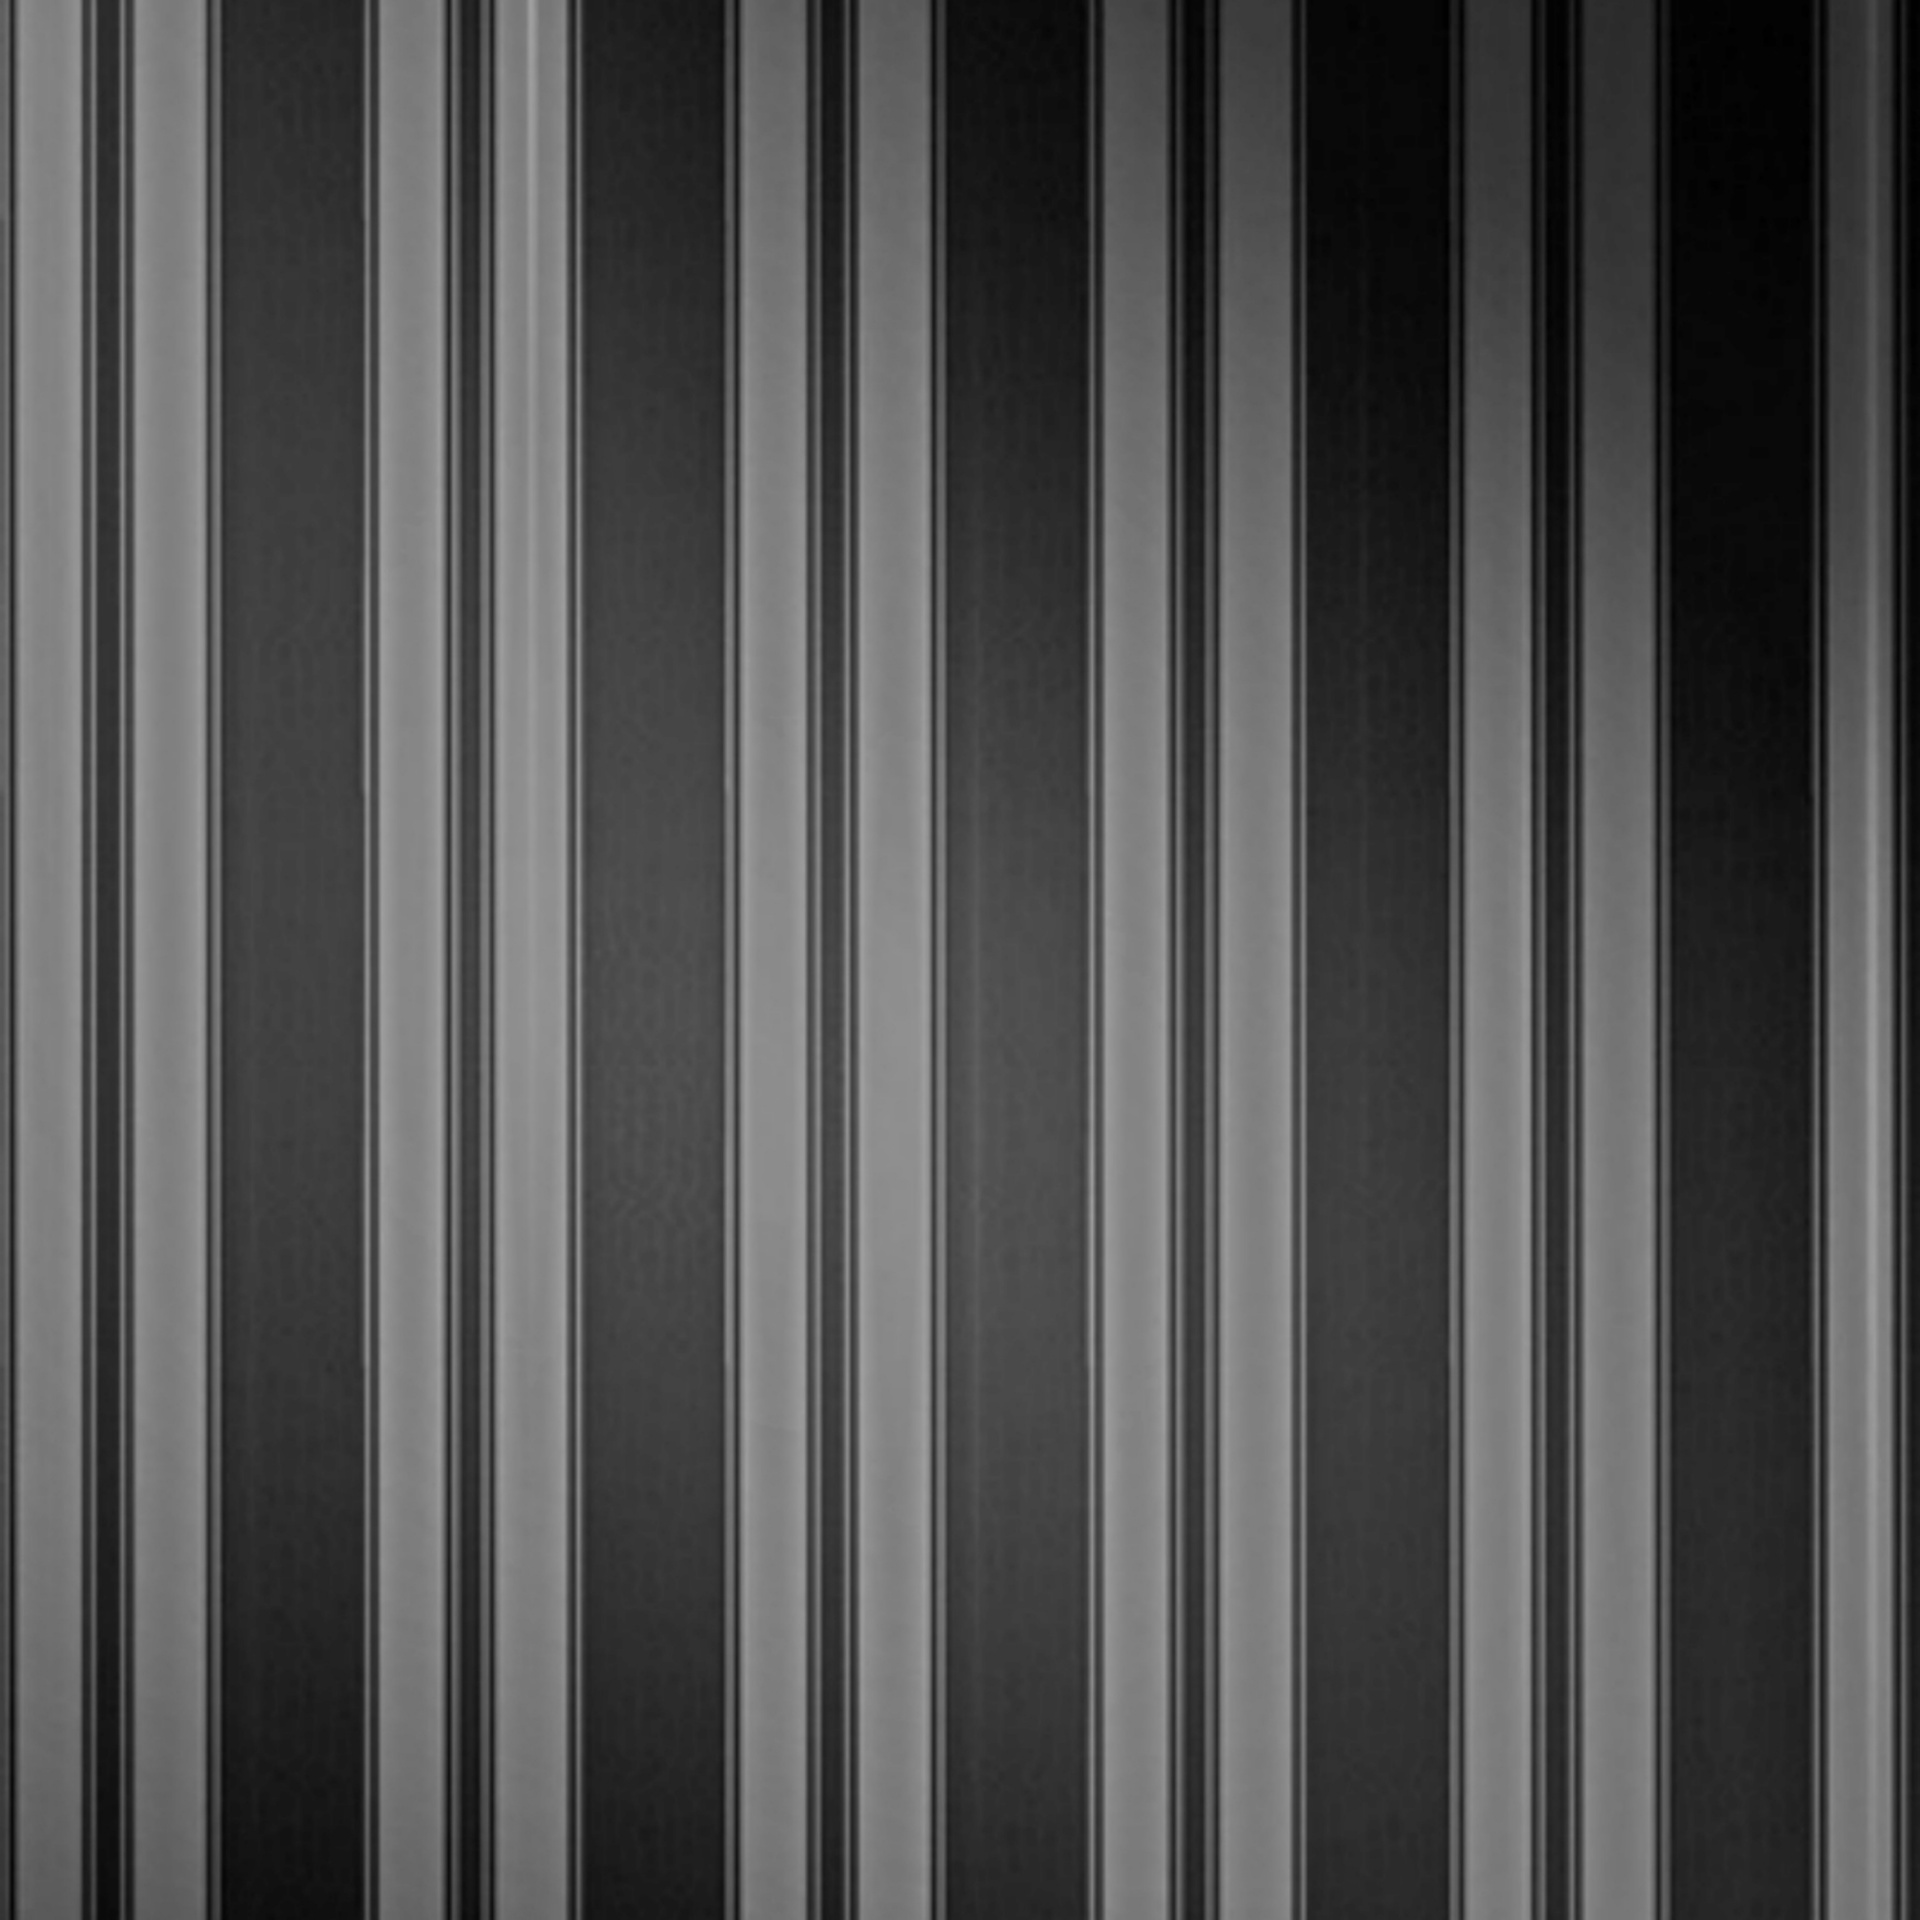 Download 300+ Wallpaper Black Vertical HD Paling Baru